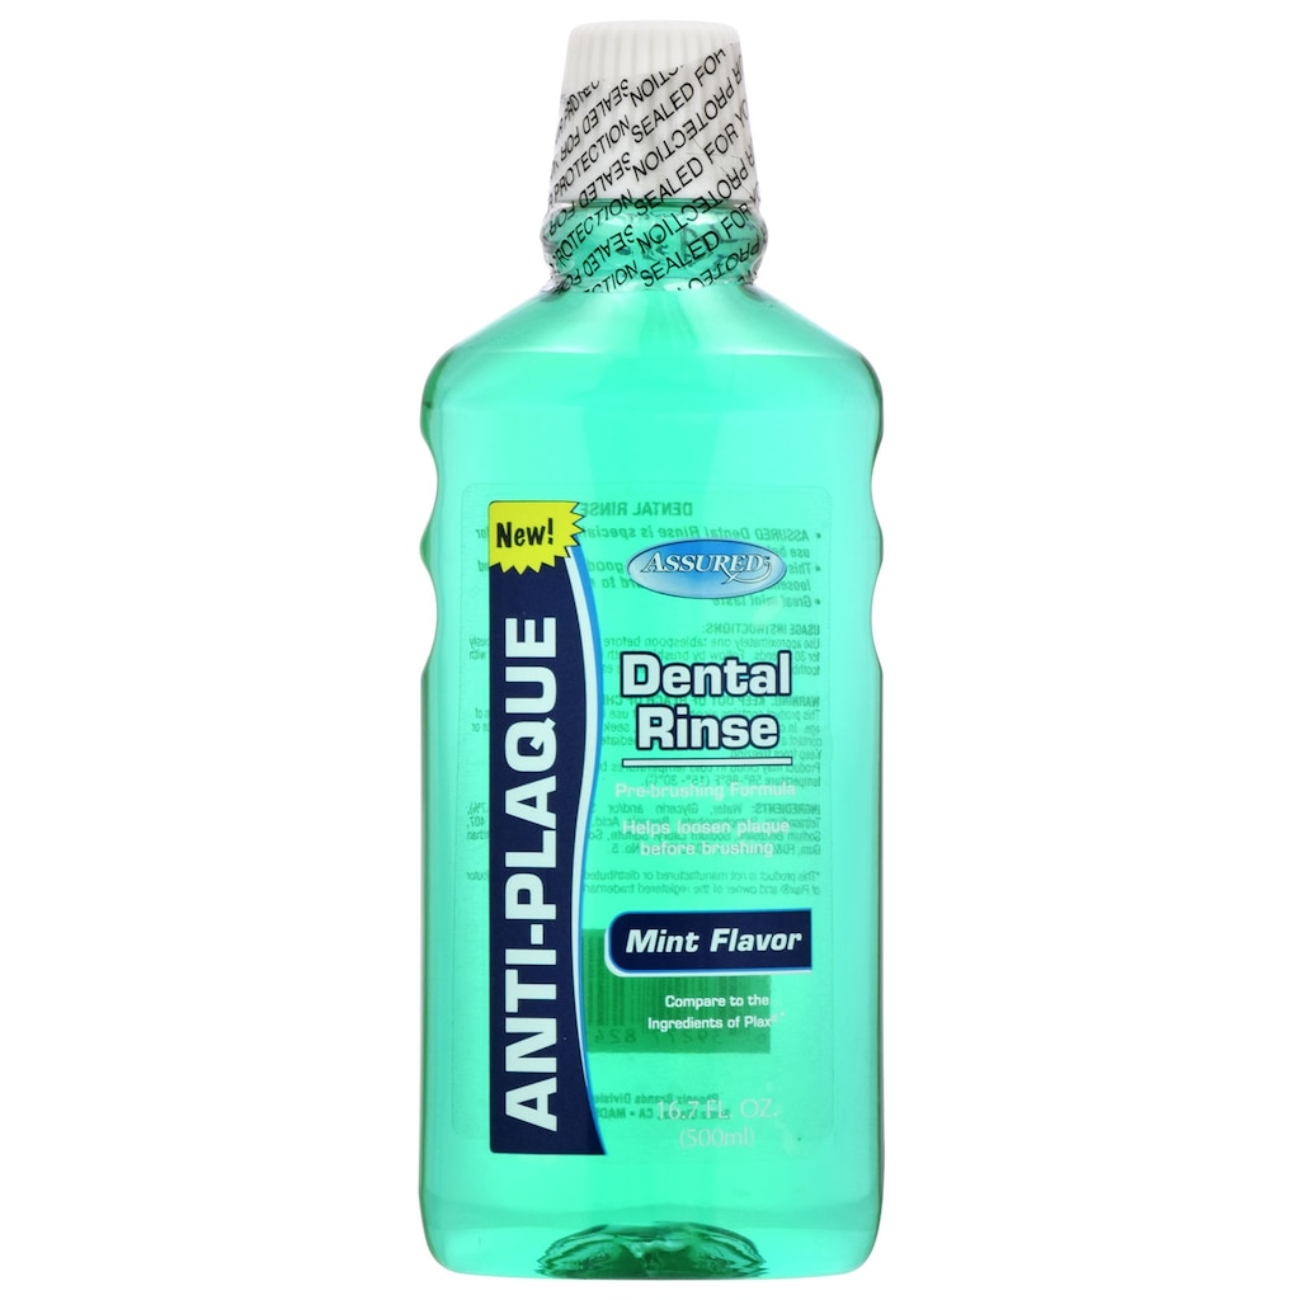 Assured Mouthwash Dollar Tree Inc Listerine Gum Care 500ml Free Pouch Mint Flavor Anti Plaque Dental Rinse 167 Oz Bottles